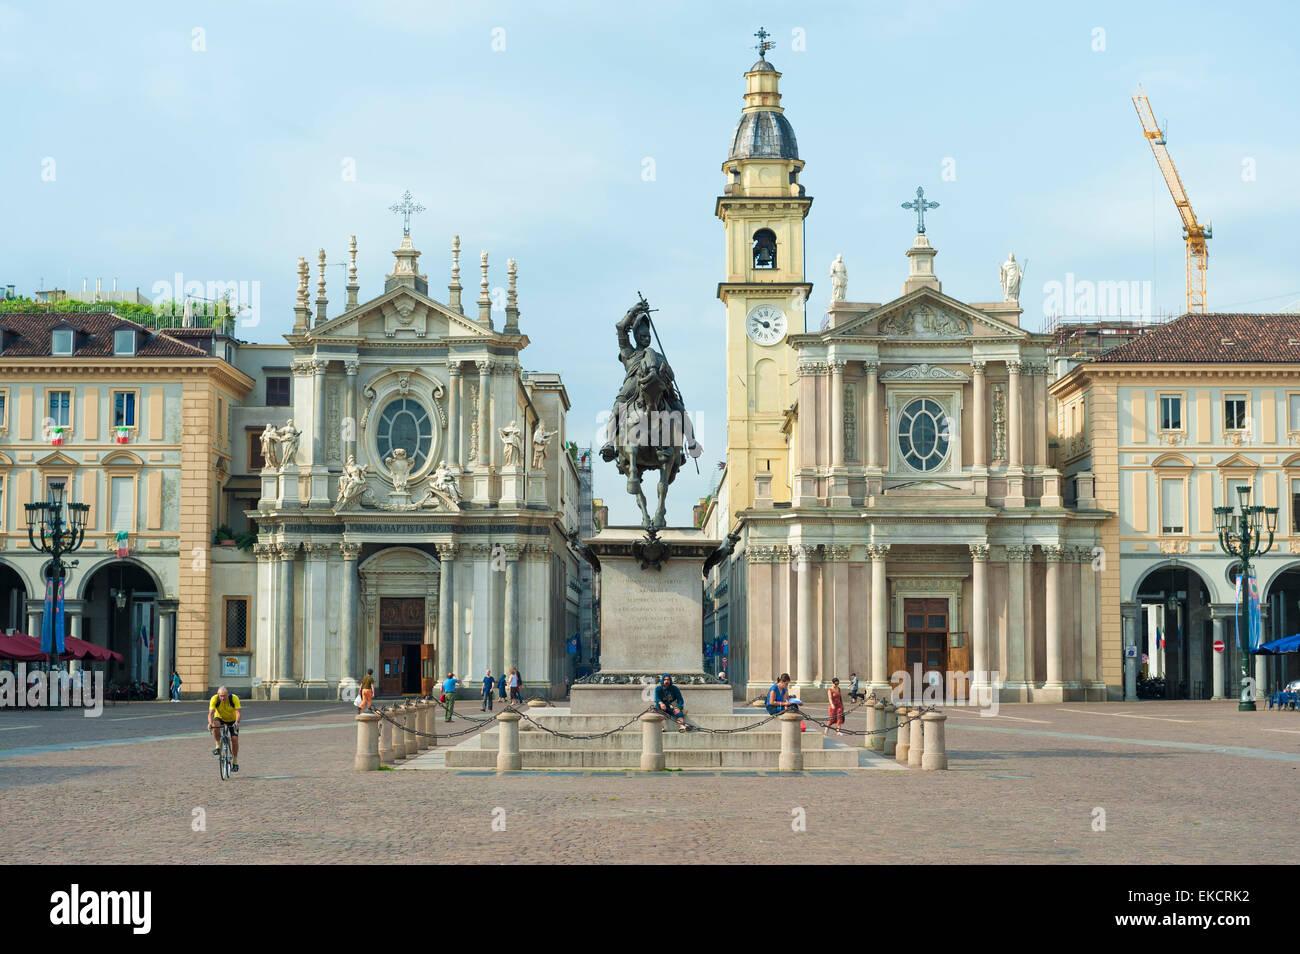 Turin Piazza San Carlo, view of the Piazza San Carlo in the center of Turin including the San Carlo Borromeo and - Stock Image